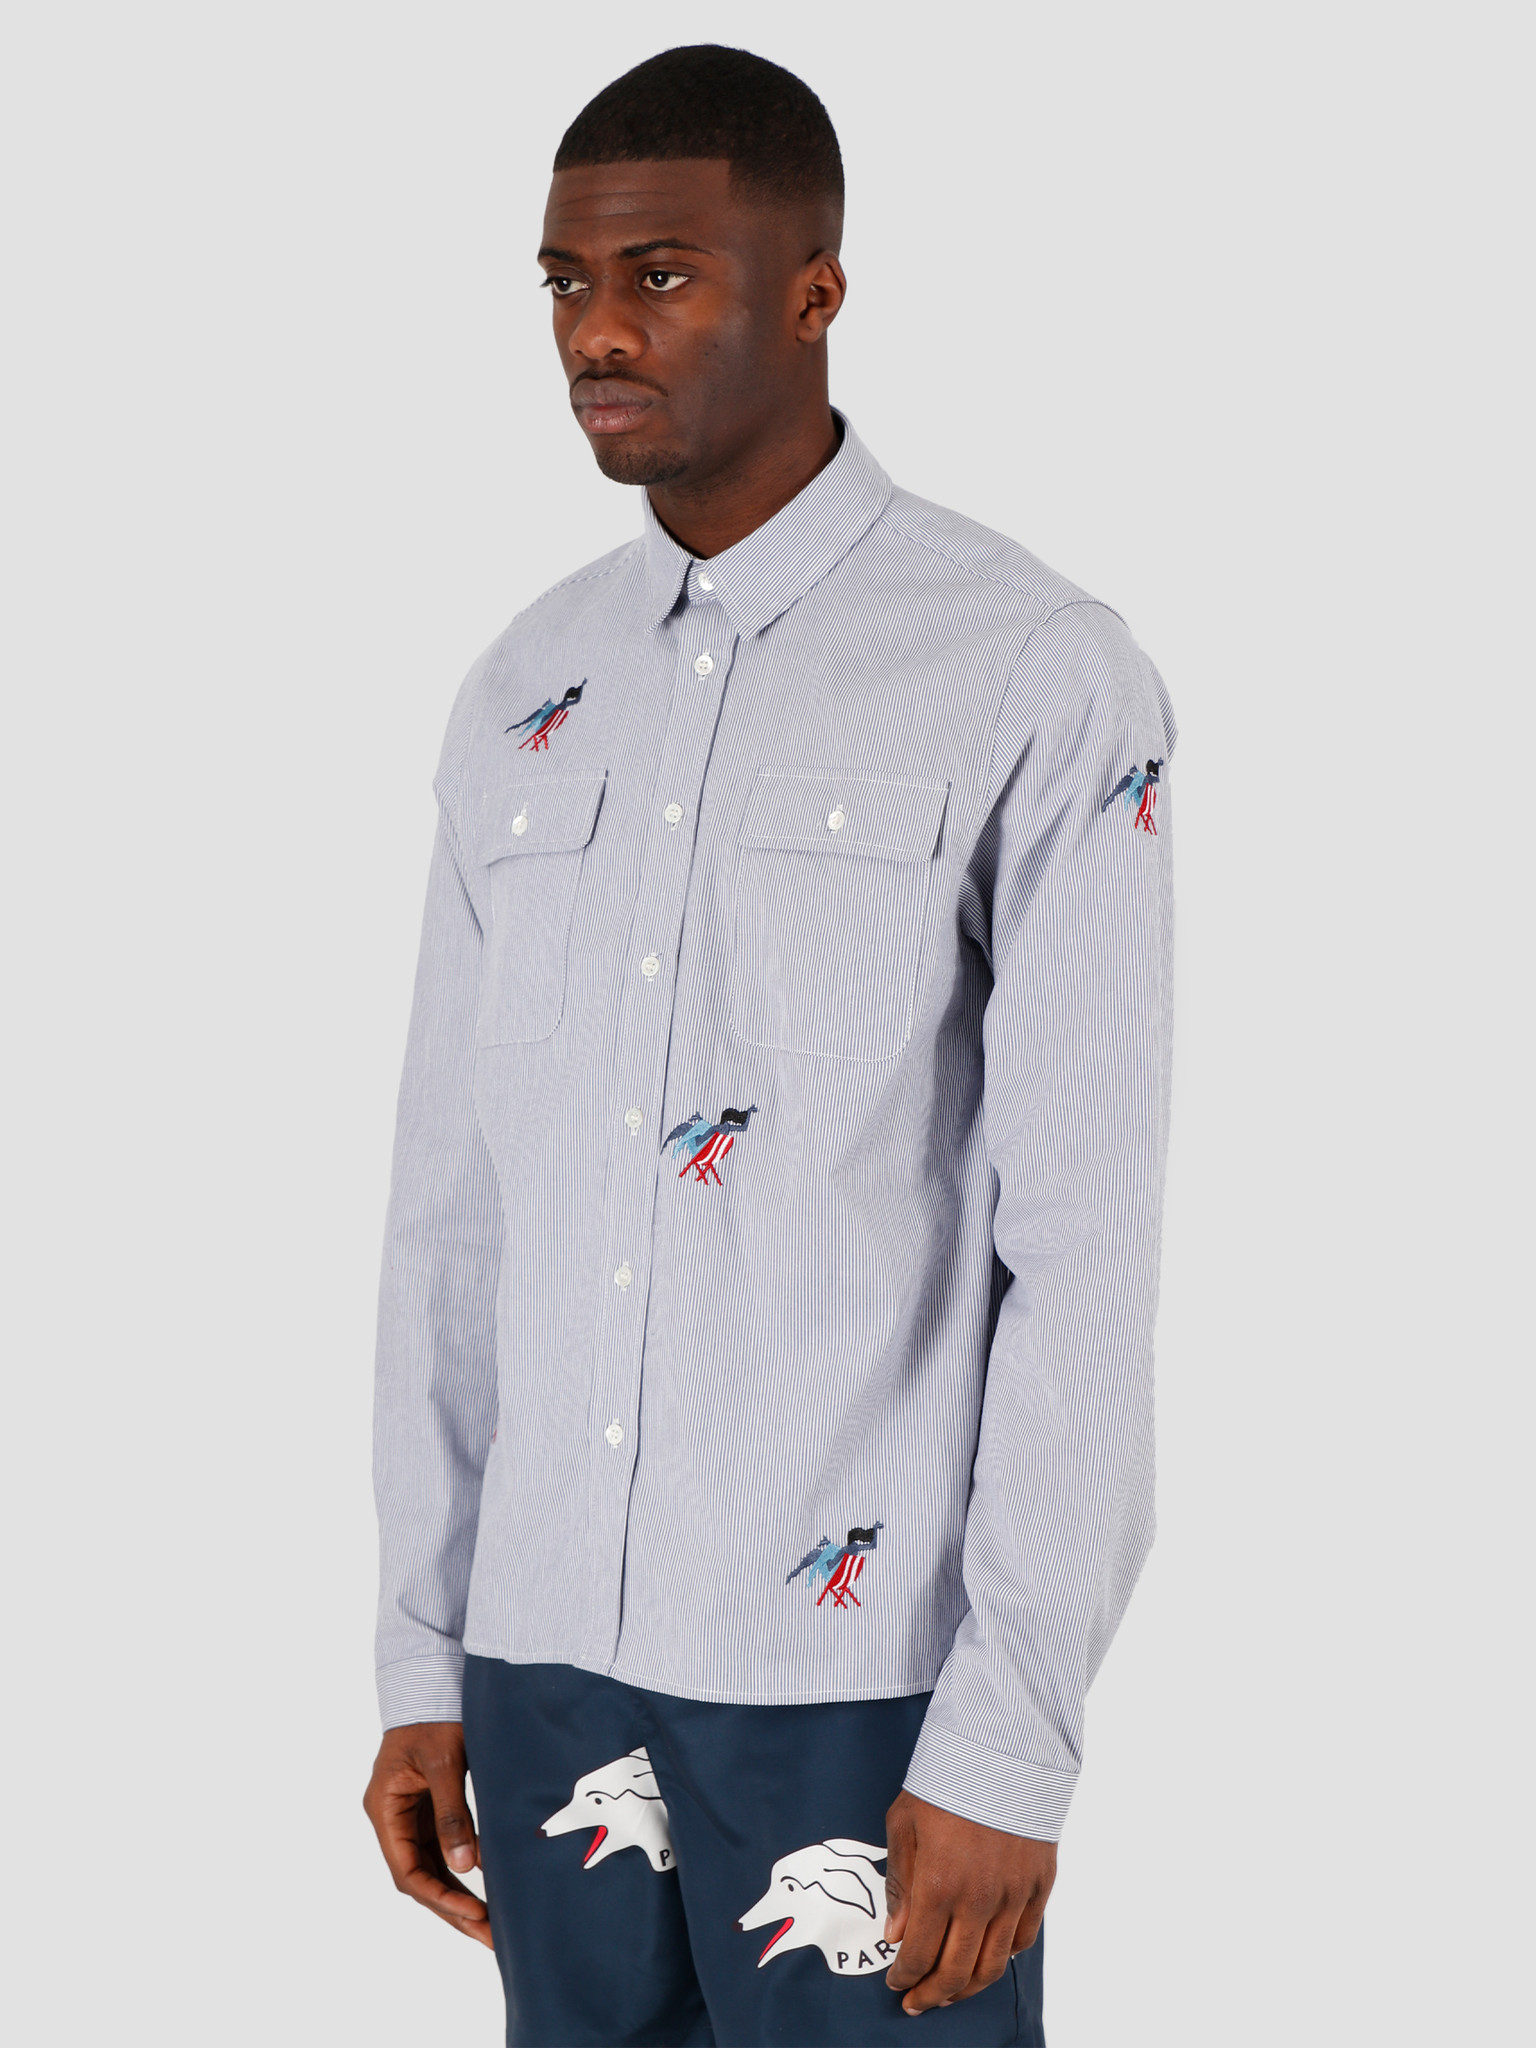 by Parra by Parra Madame Beach Striped Shirt Blue White Stripe 43800